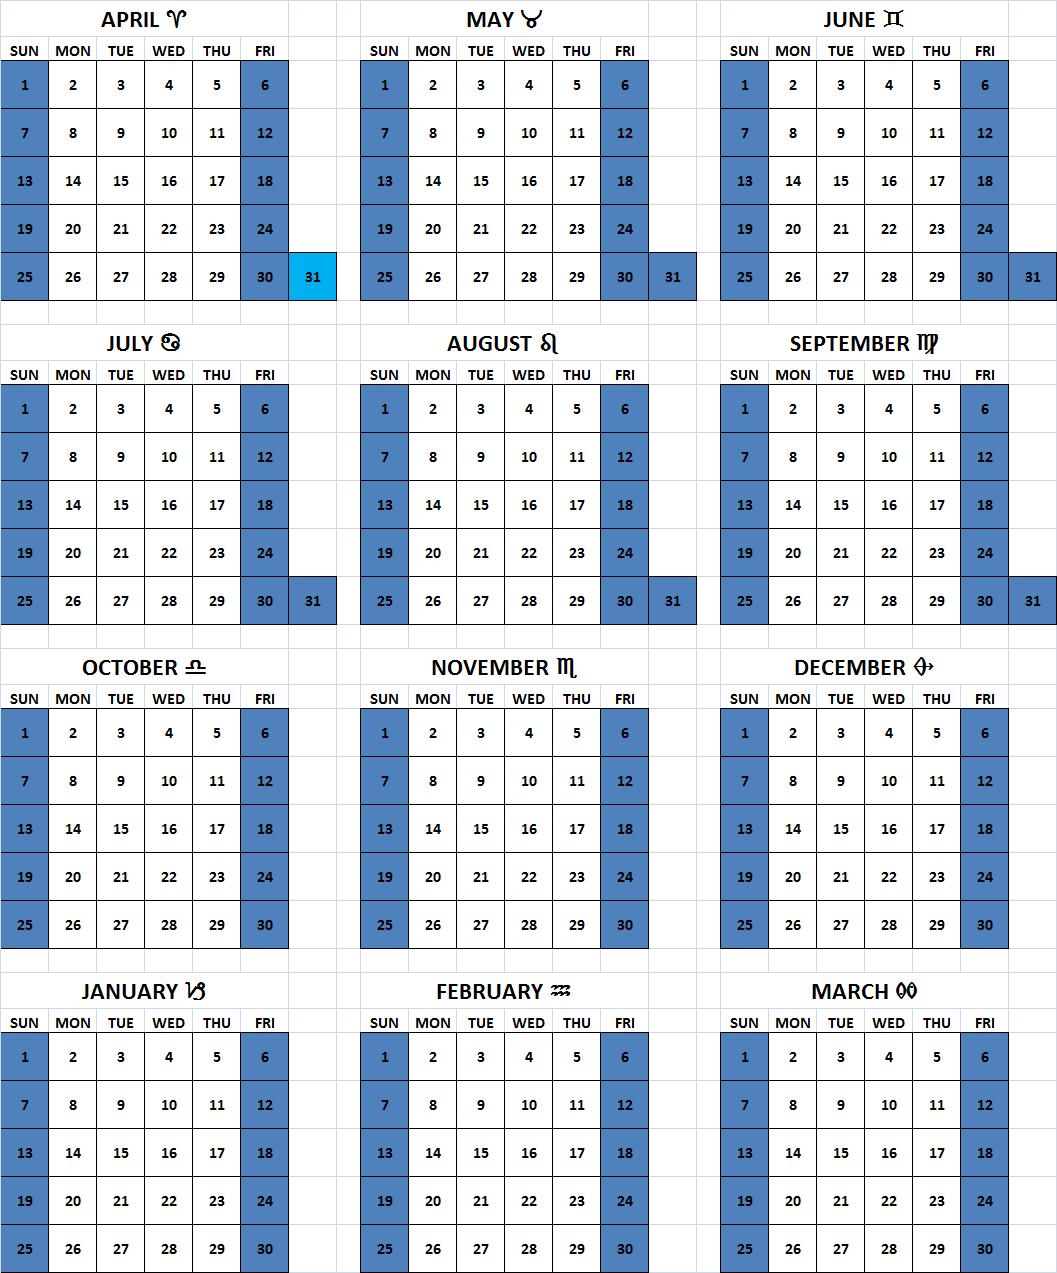 6-Day Week Solar Calendar with common Muslim/Christian weekend